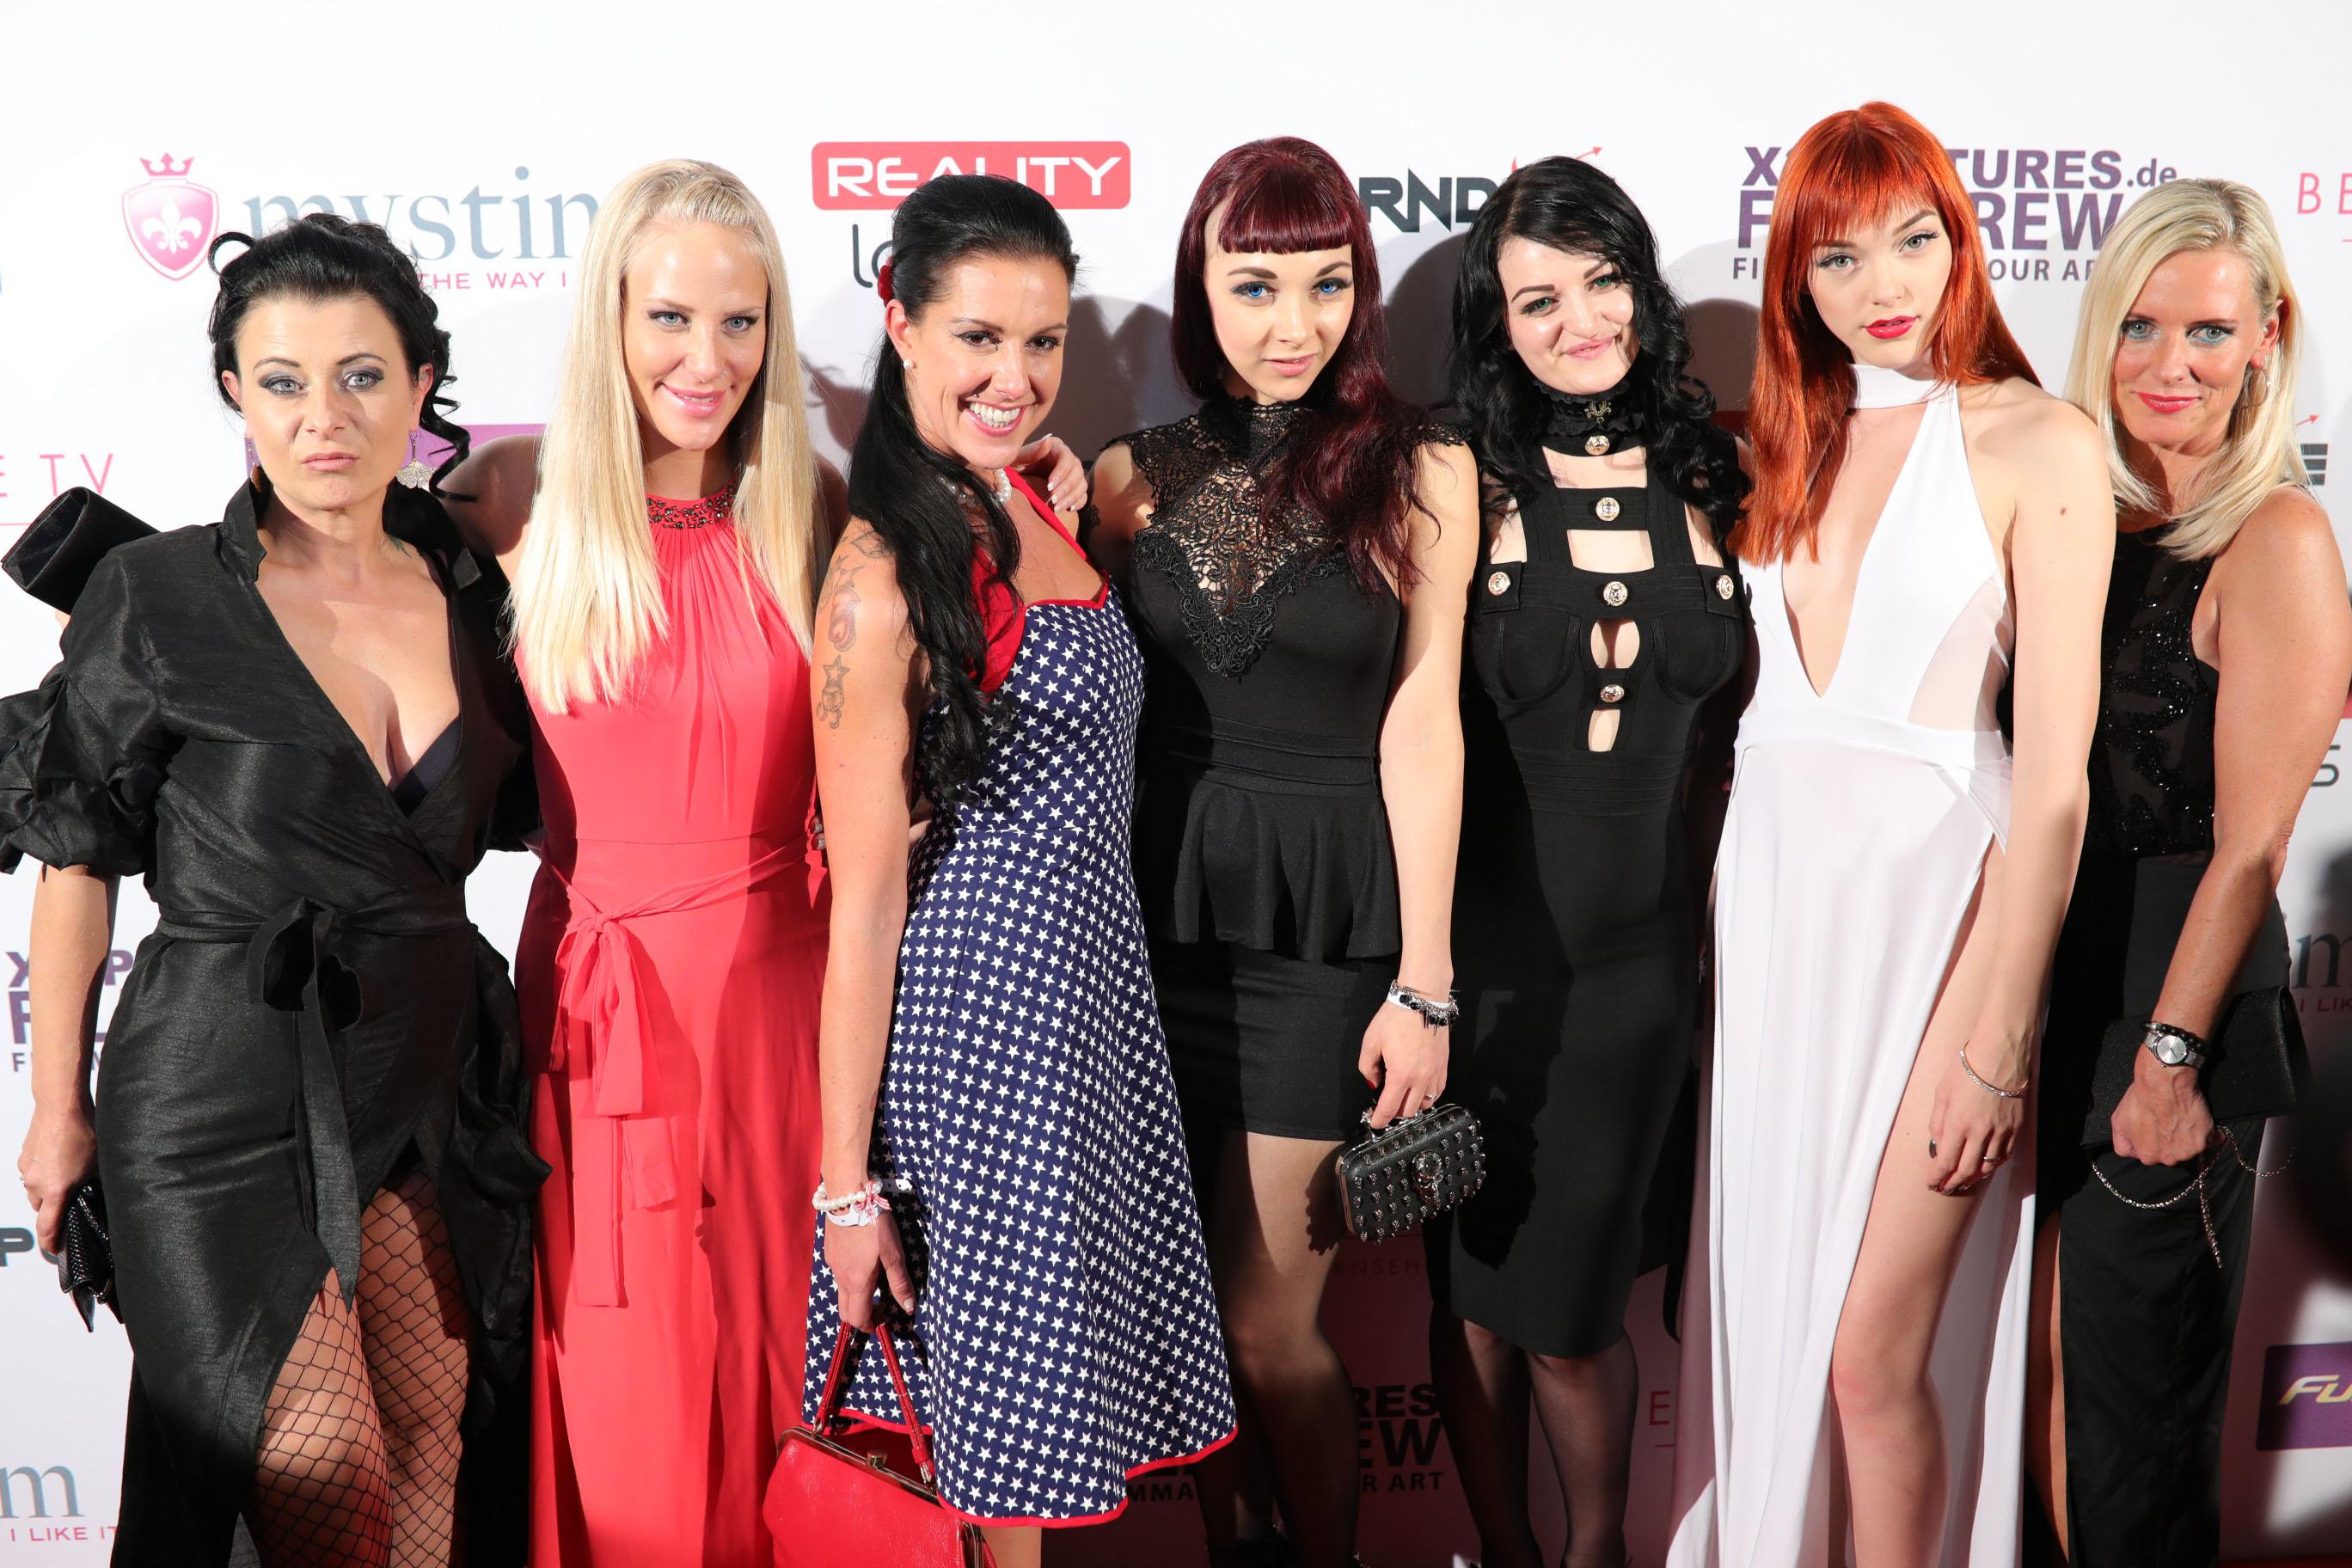 Venus Award Show 2016 - Venus Adult News